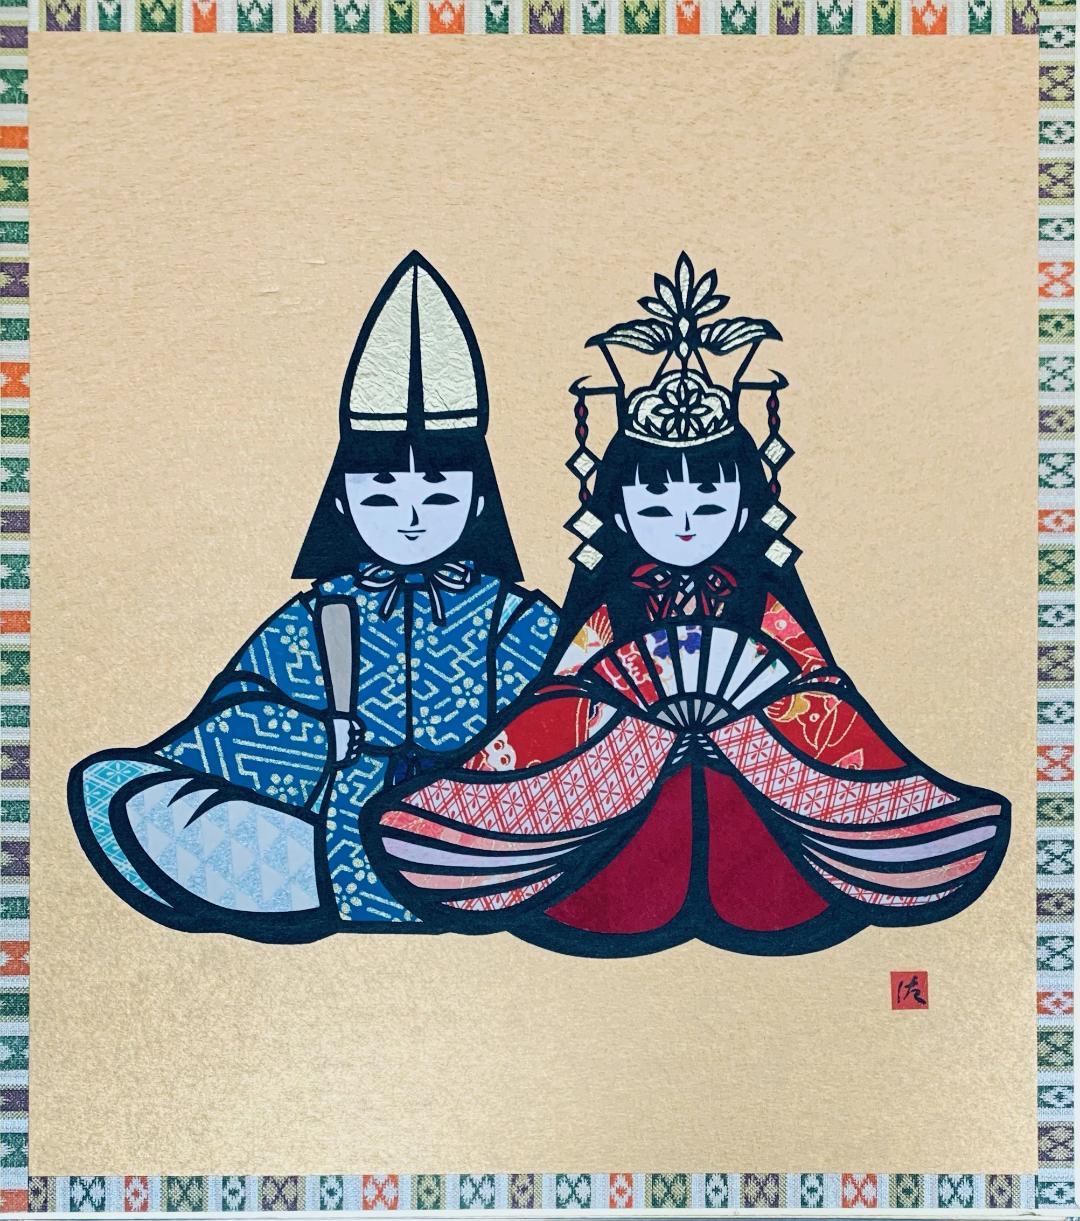 Girls Day Dolls by Satchi Tanimoto